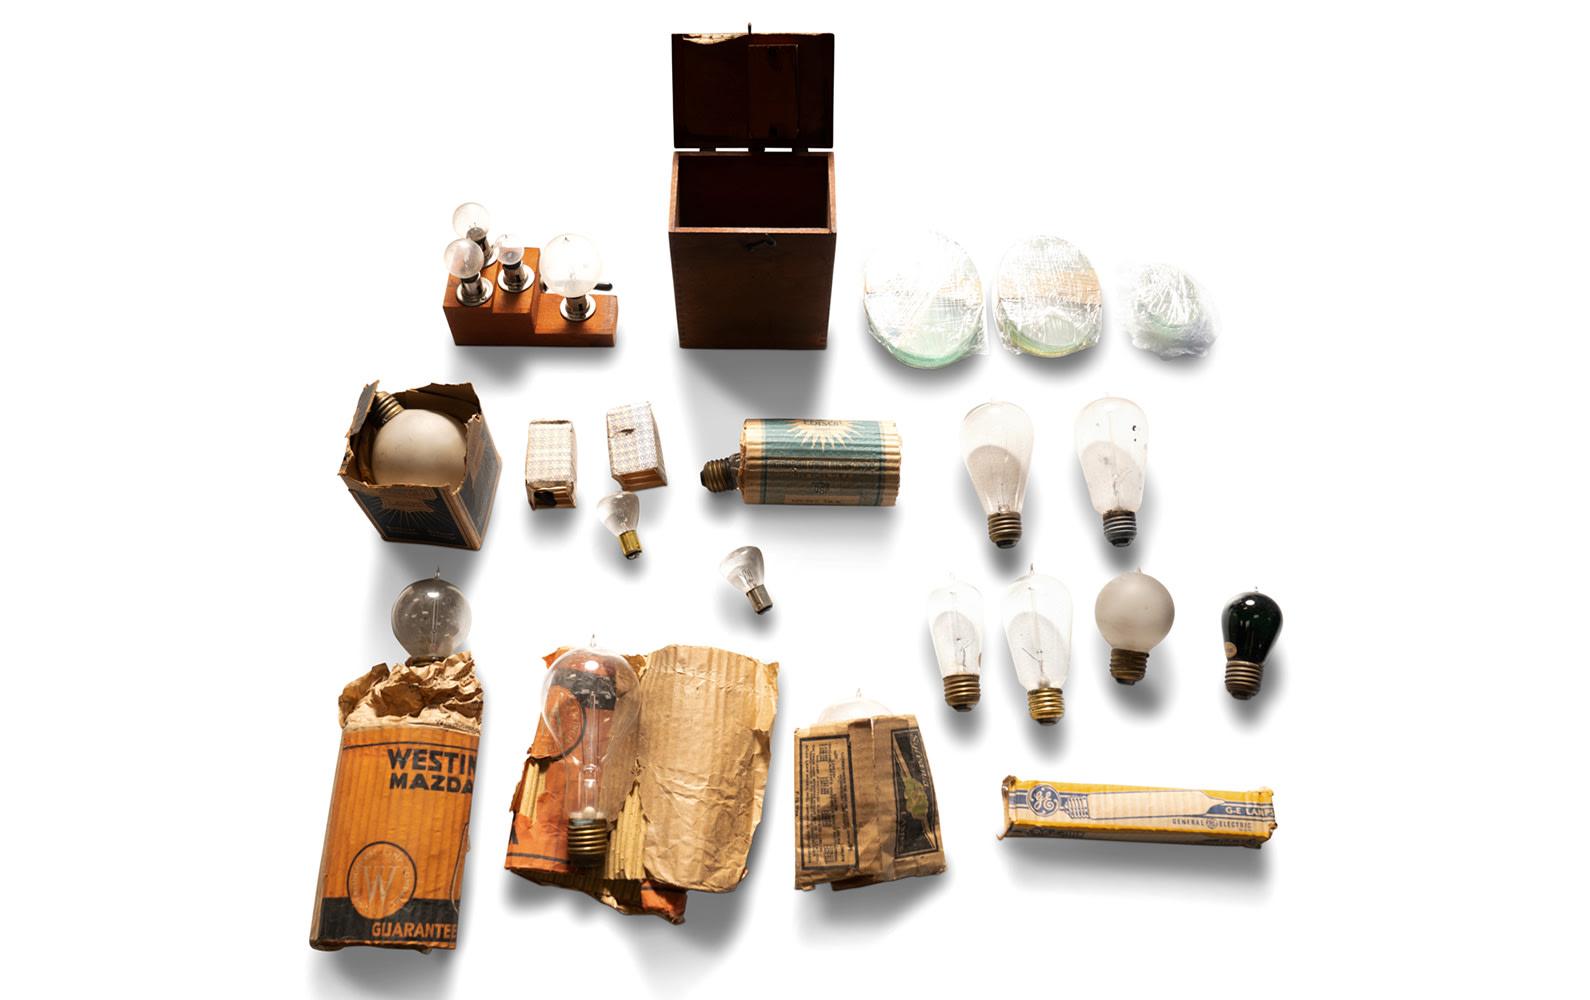 Prod/O21E - Phil Hill C 2021/C0113_Assorted Vintage Bulbs and Ovoid Glass/C0113_Vintage_Bulbs_Ovoid_Glass_1_psx337